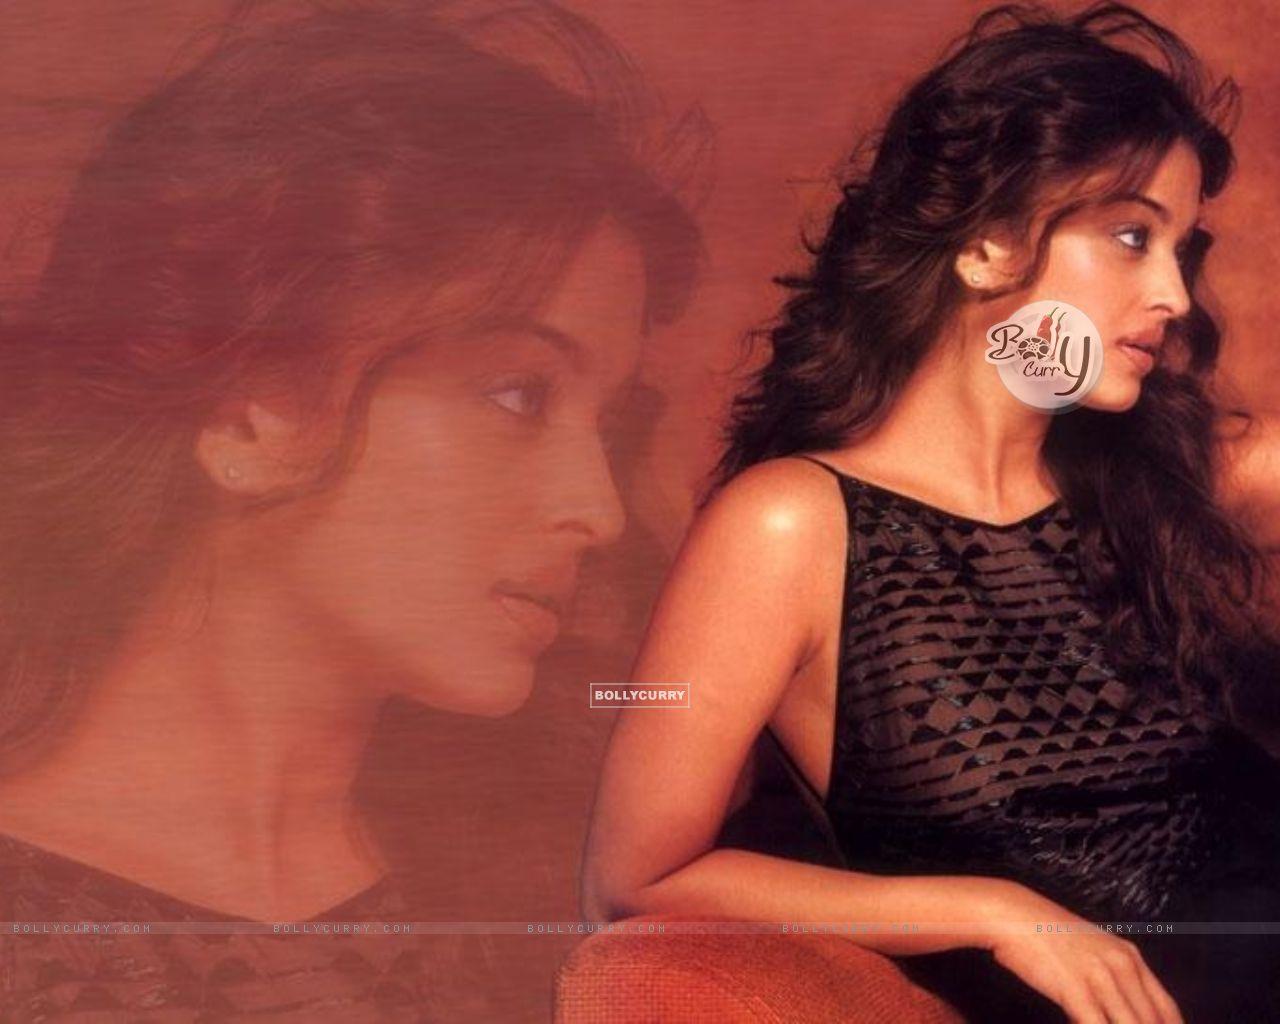 www Aishwarya Rai videoer com datesider